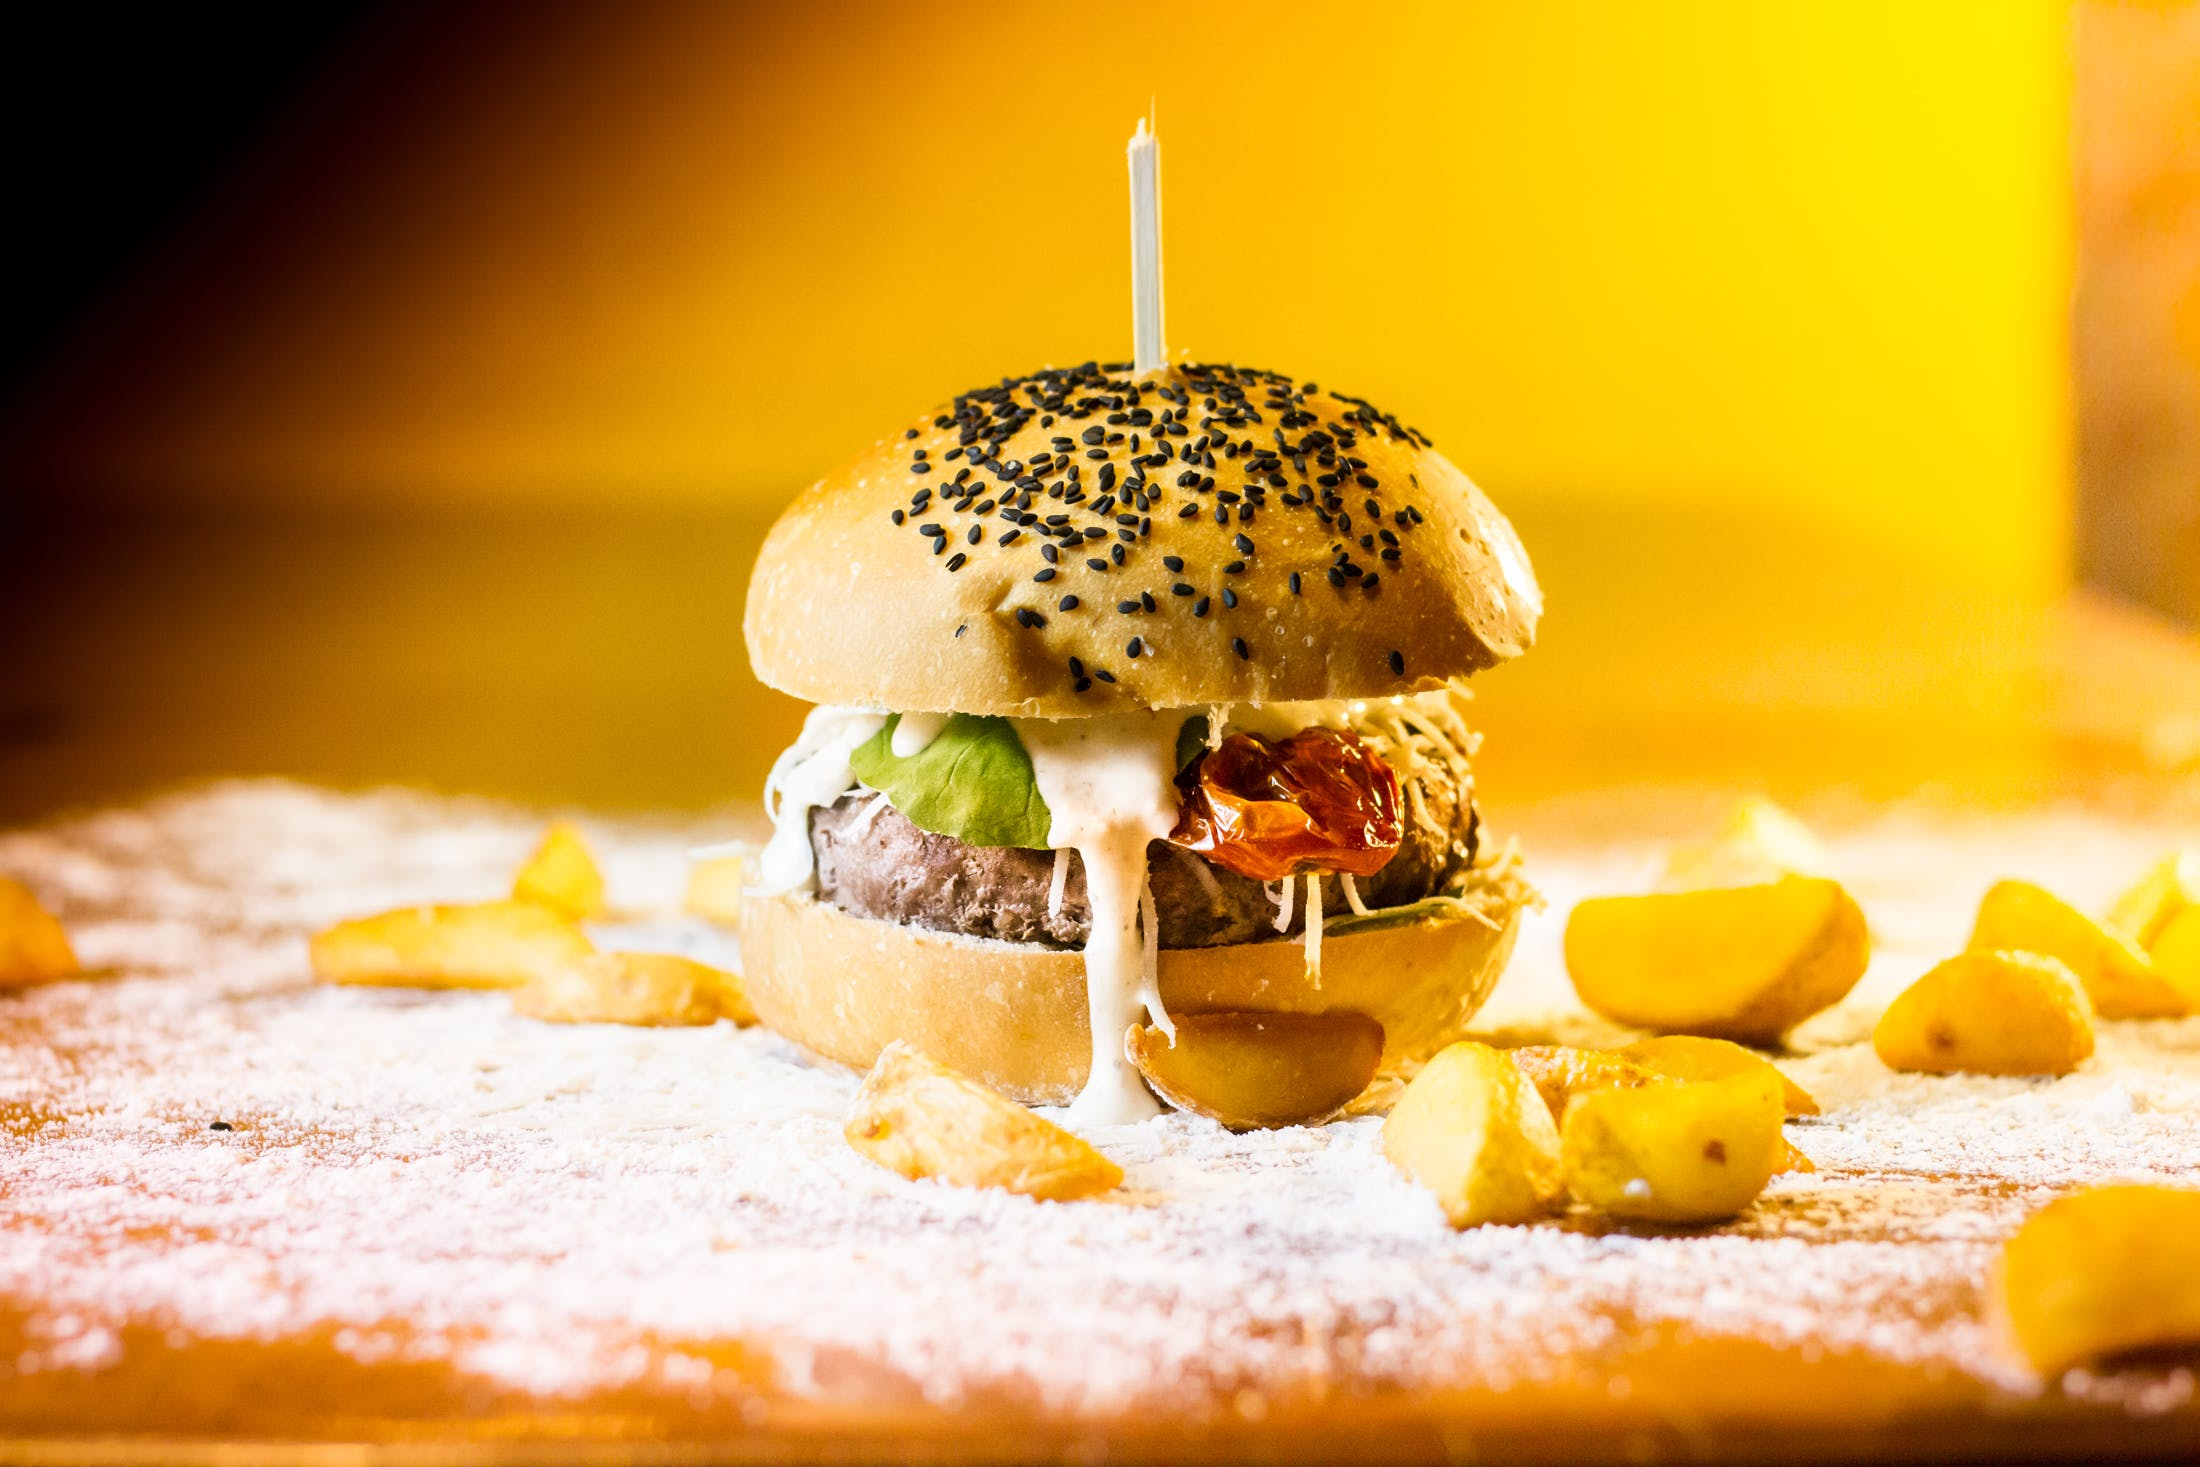 Free stock photo of bread, food, restaurant, yellow